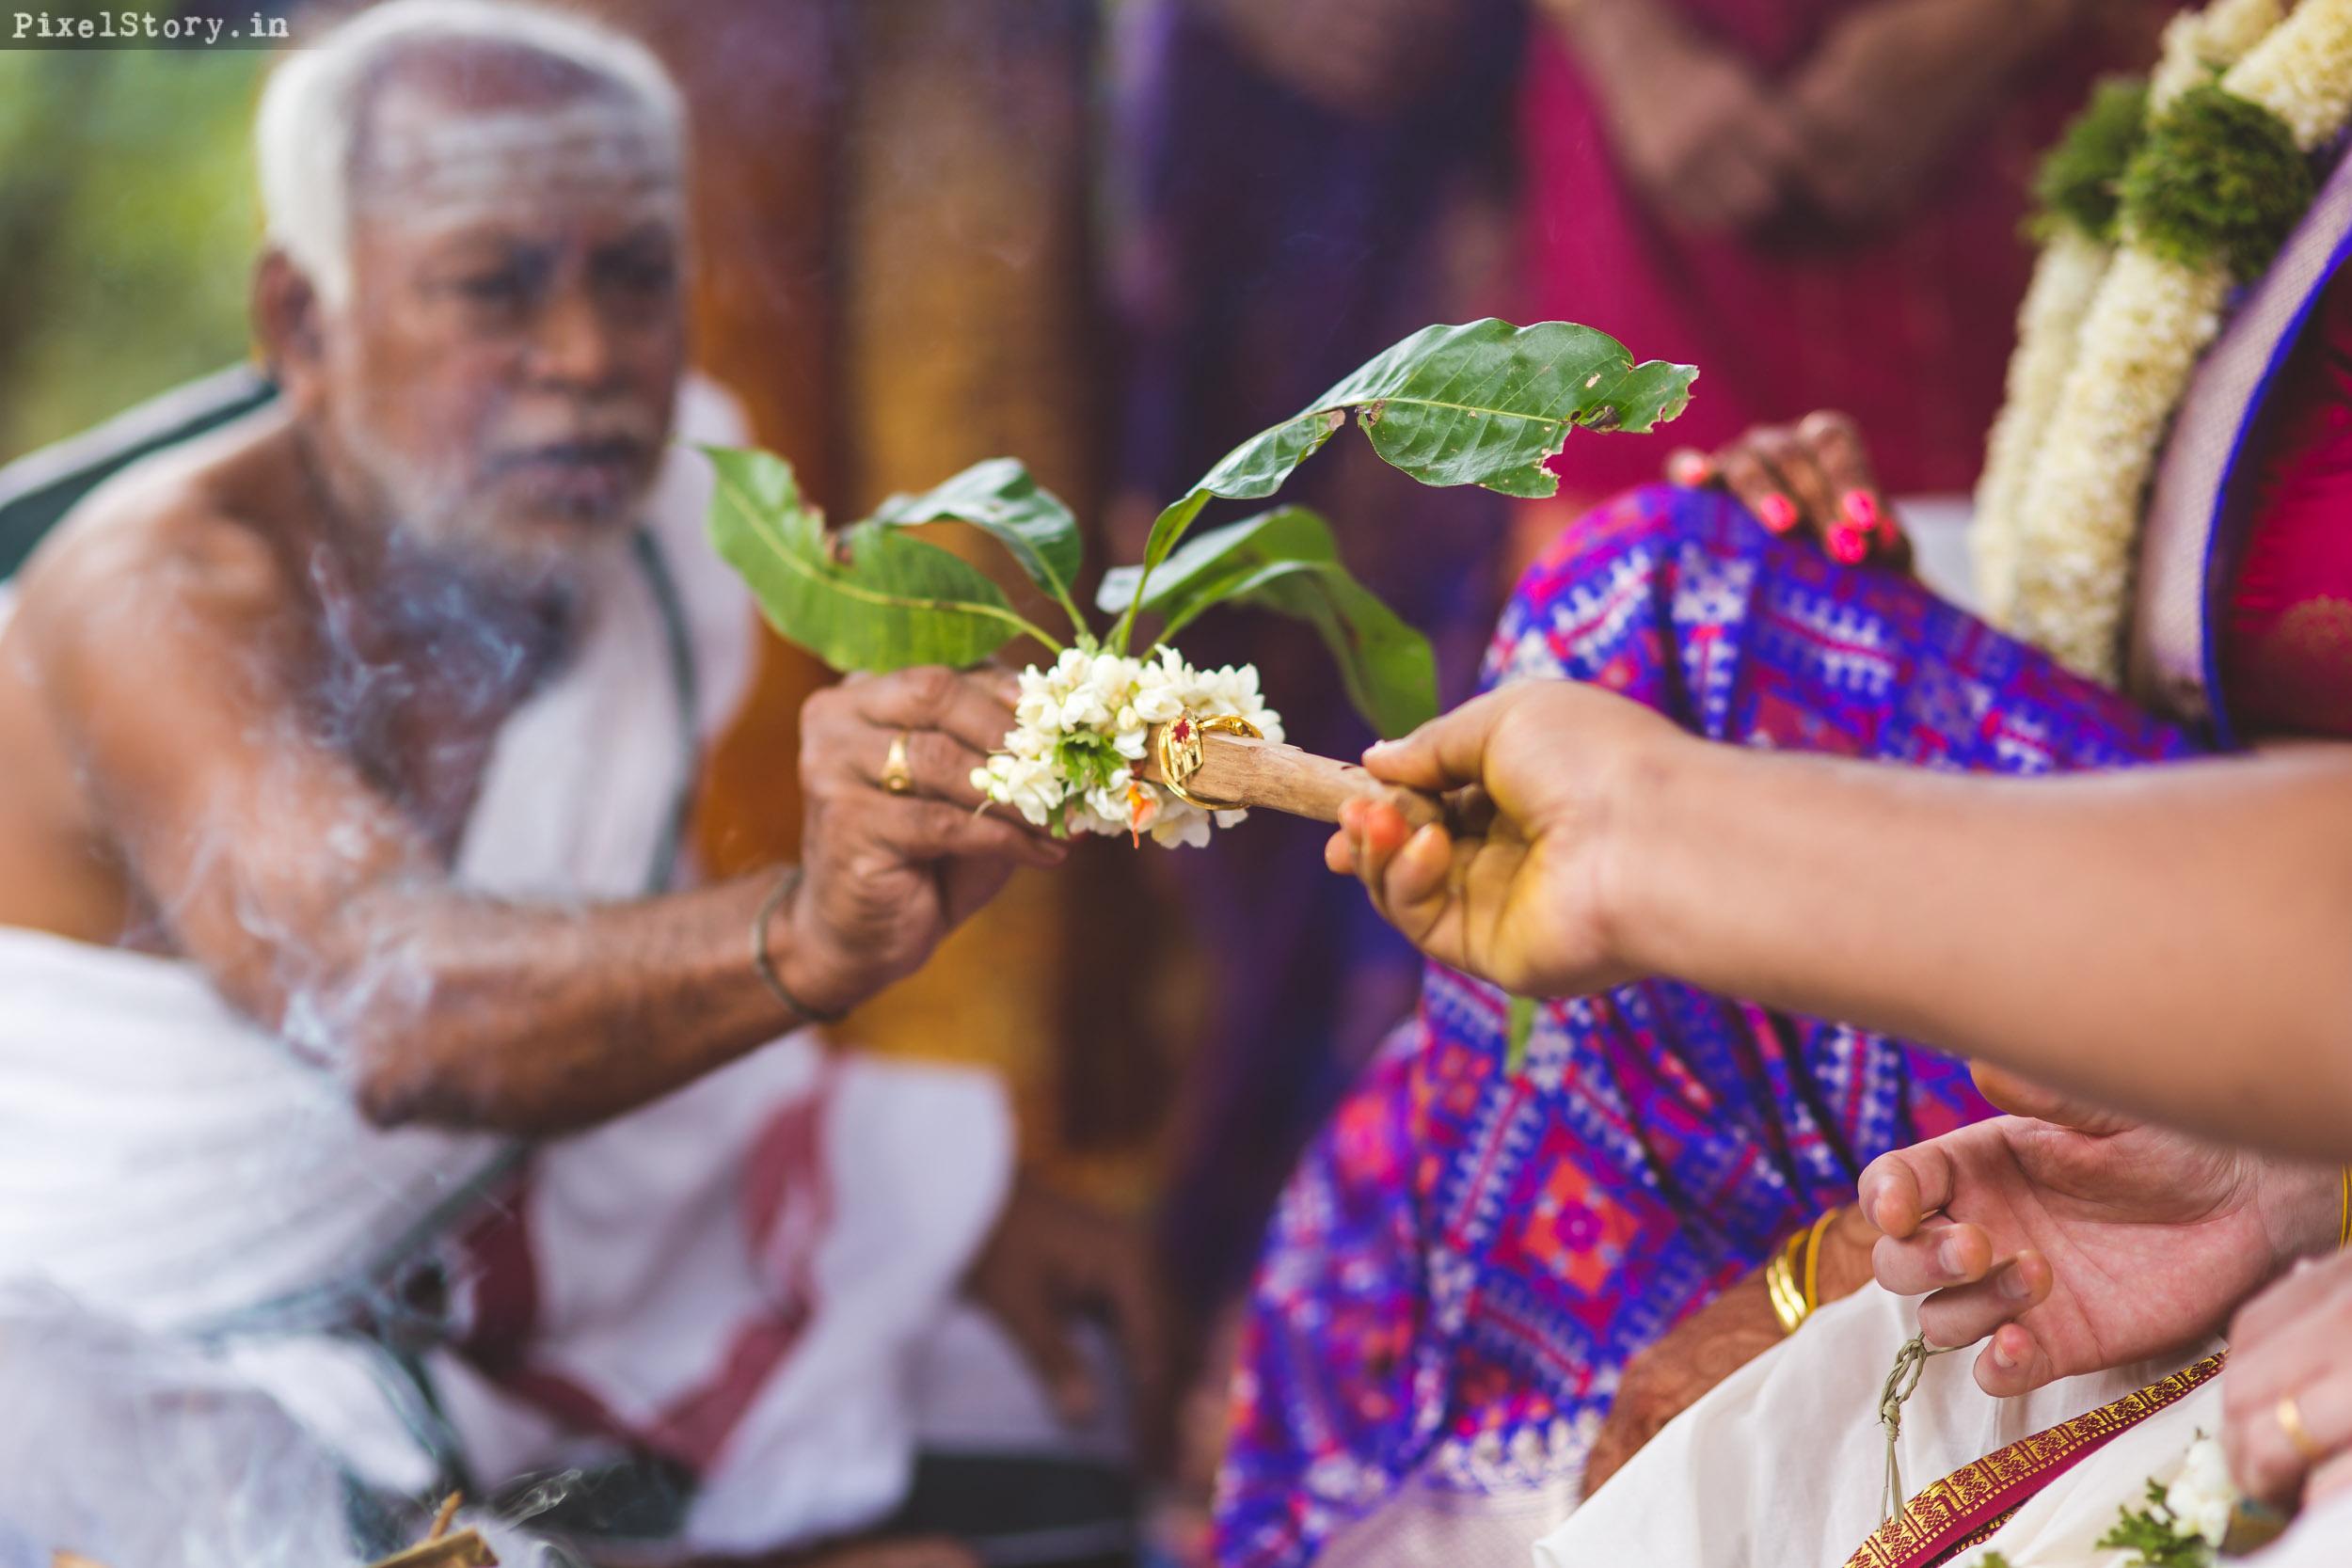 PixelStory-Jungle-Wedding-Photographer-Masinagudi-Indo-French061.jpg